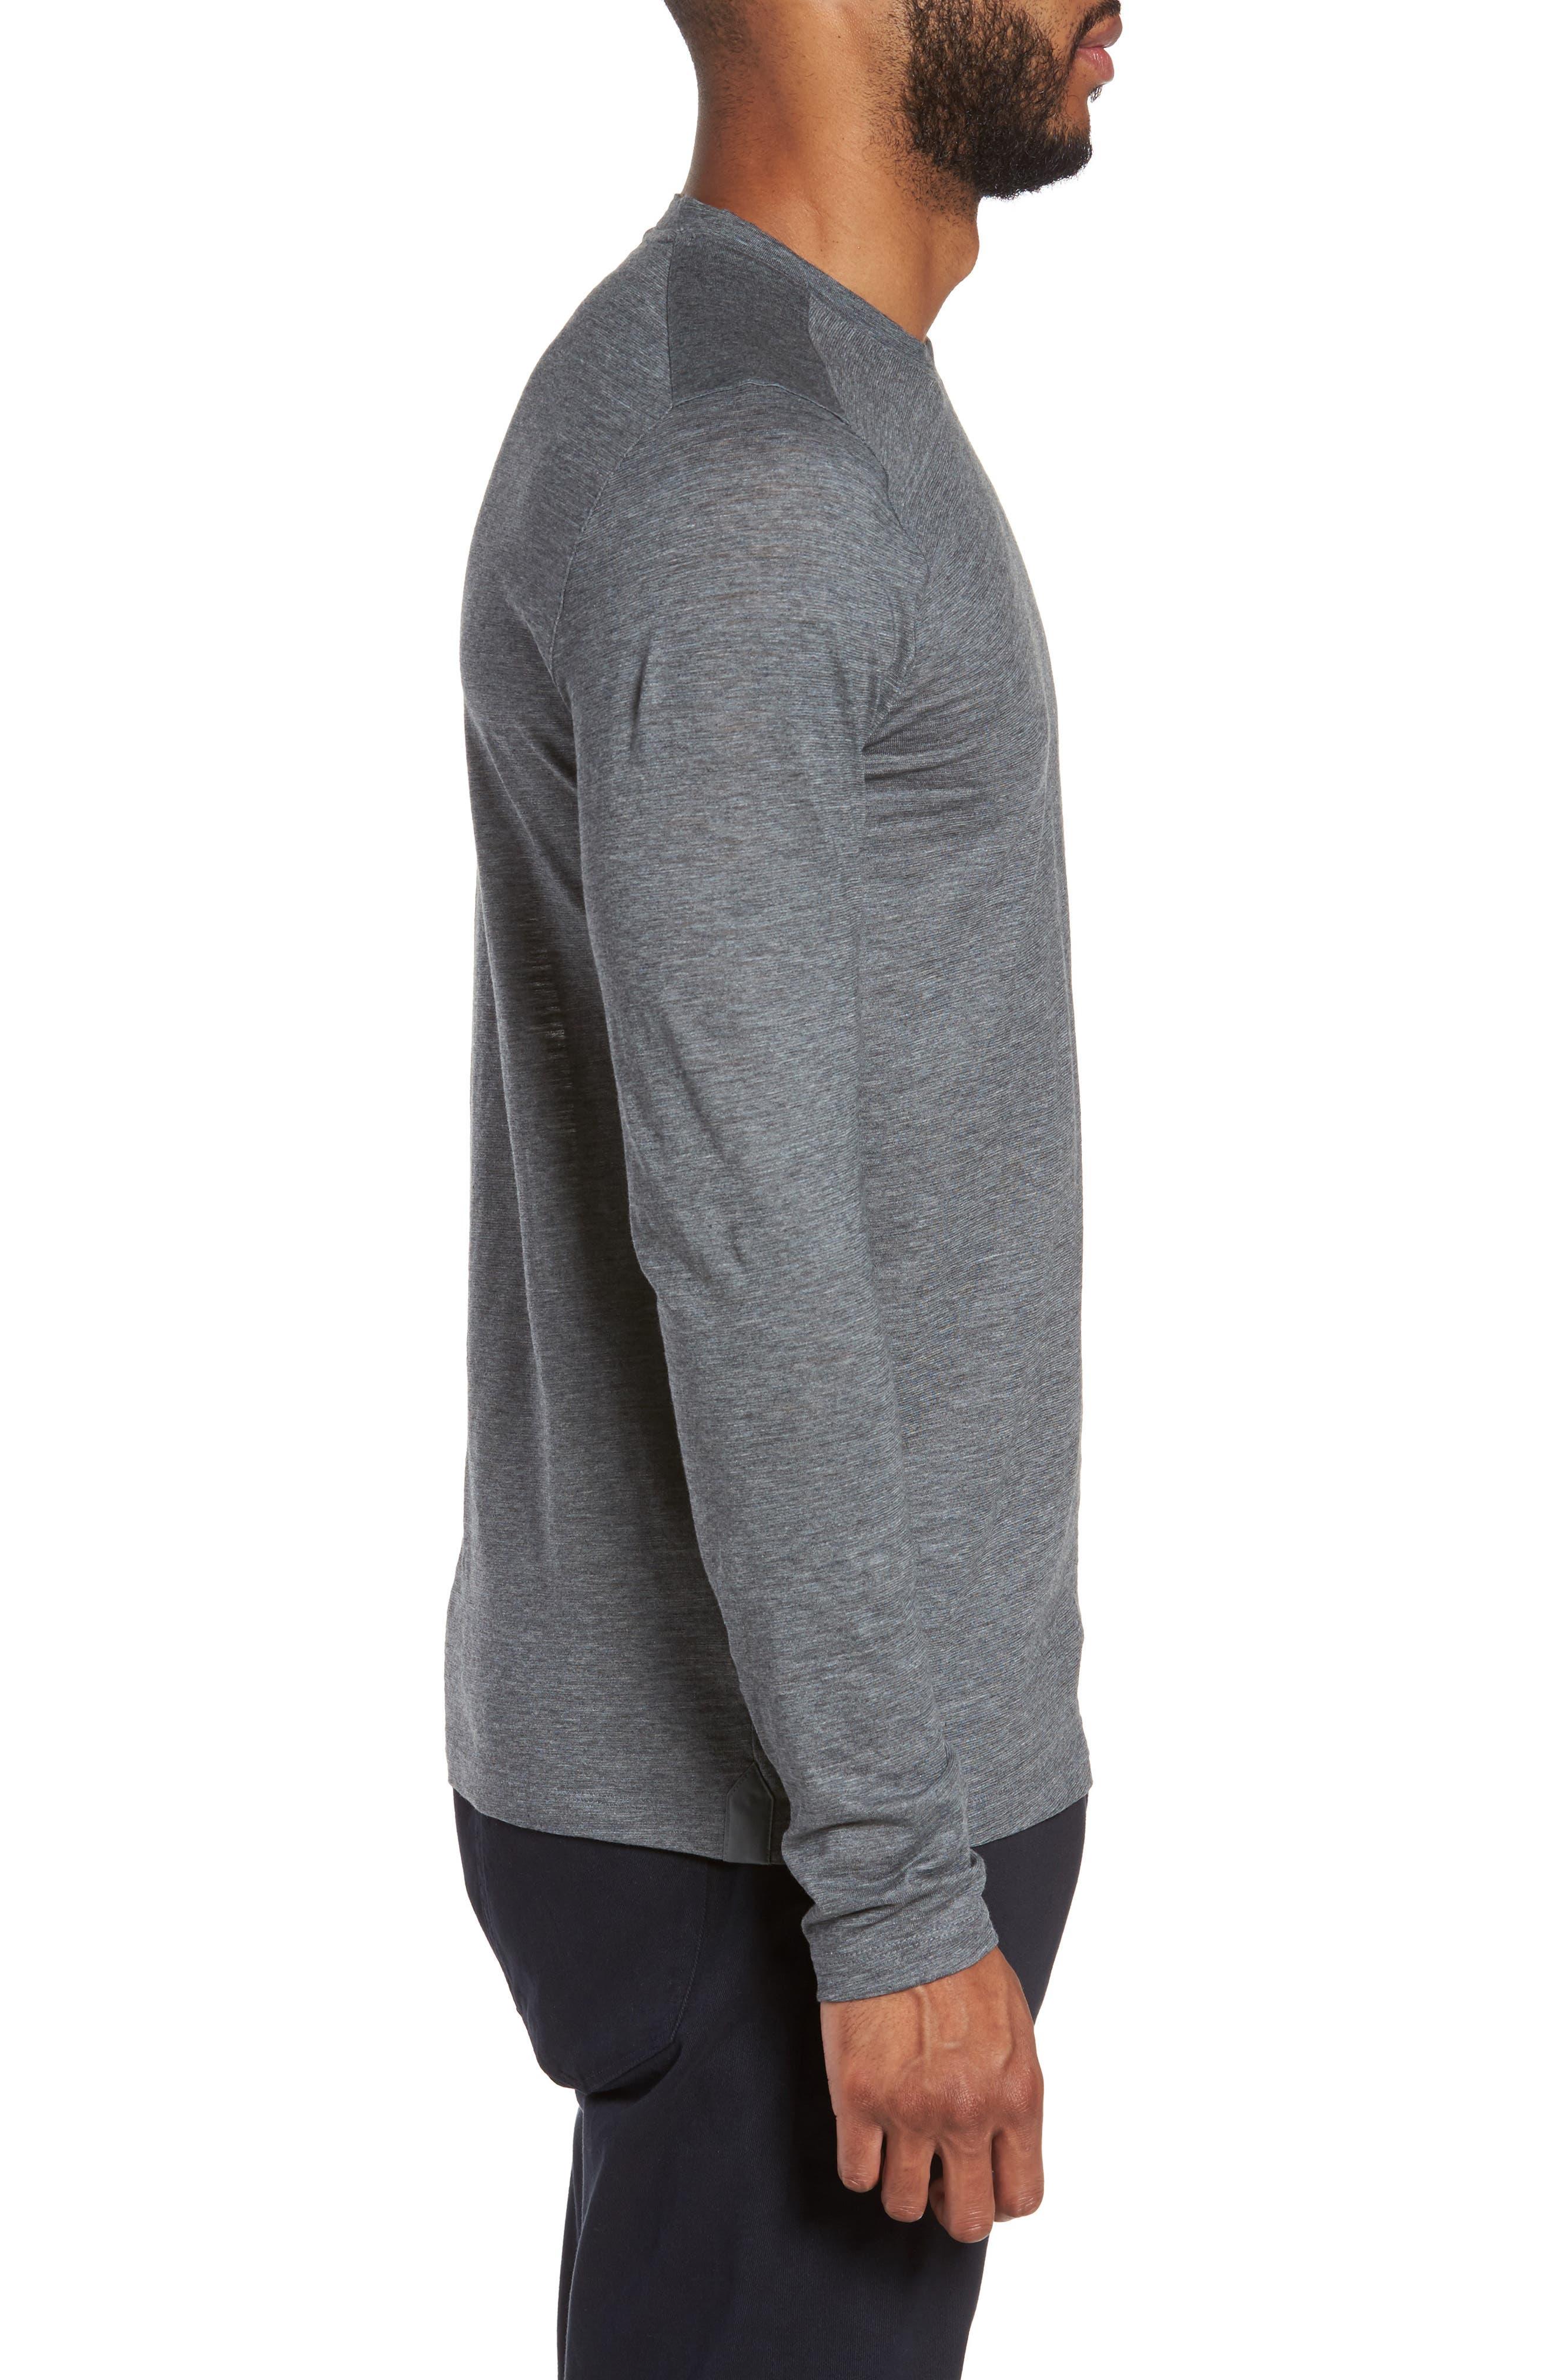 Tenison Long Sleeve T-Shirt,                             Alternate thumbnail 3, color,                             030